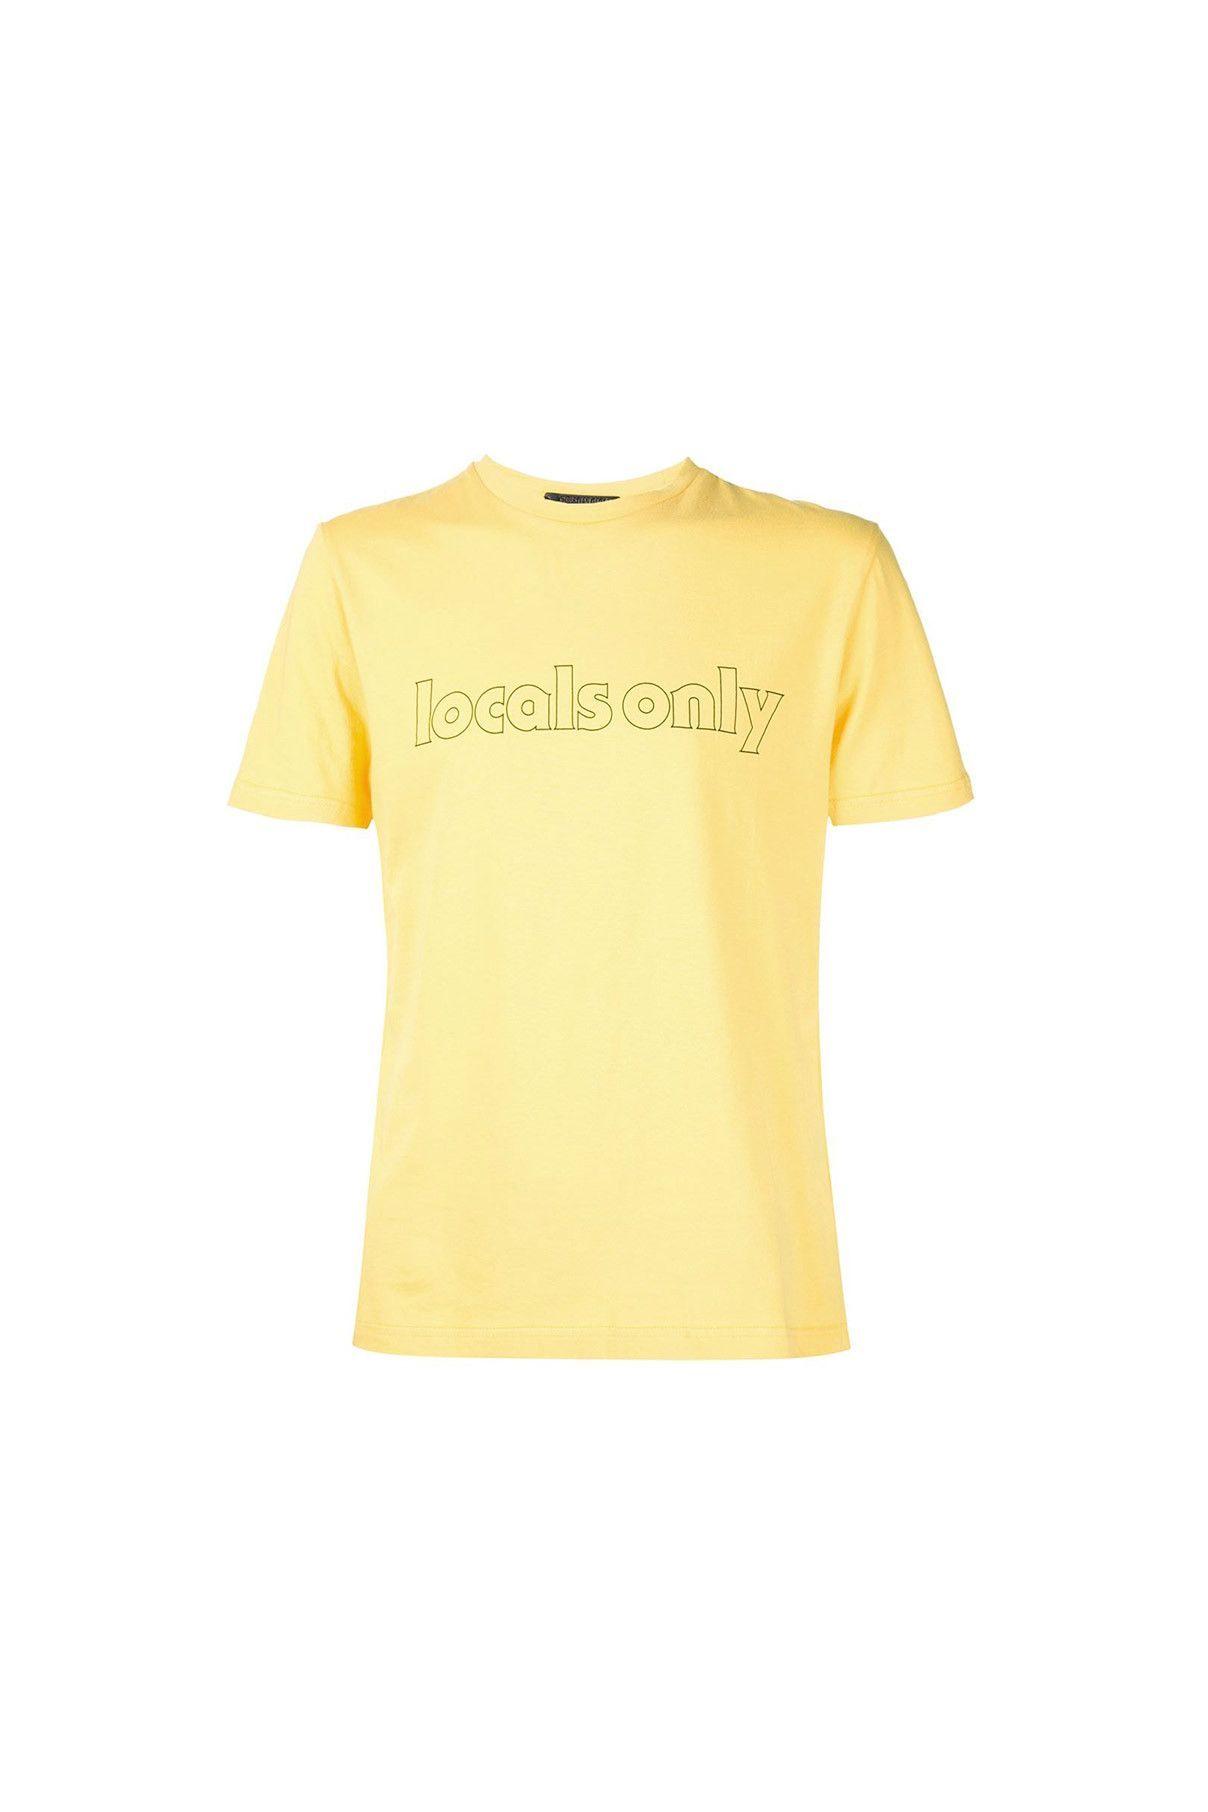 {Christian Dada / 01 clothing / 04 knitwear / 01 t-shirt} Locals Only T-Shirt